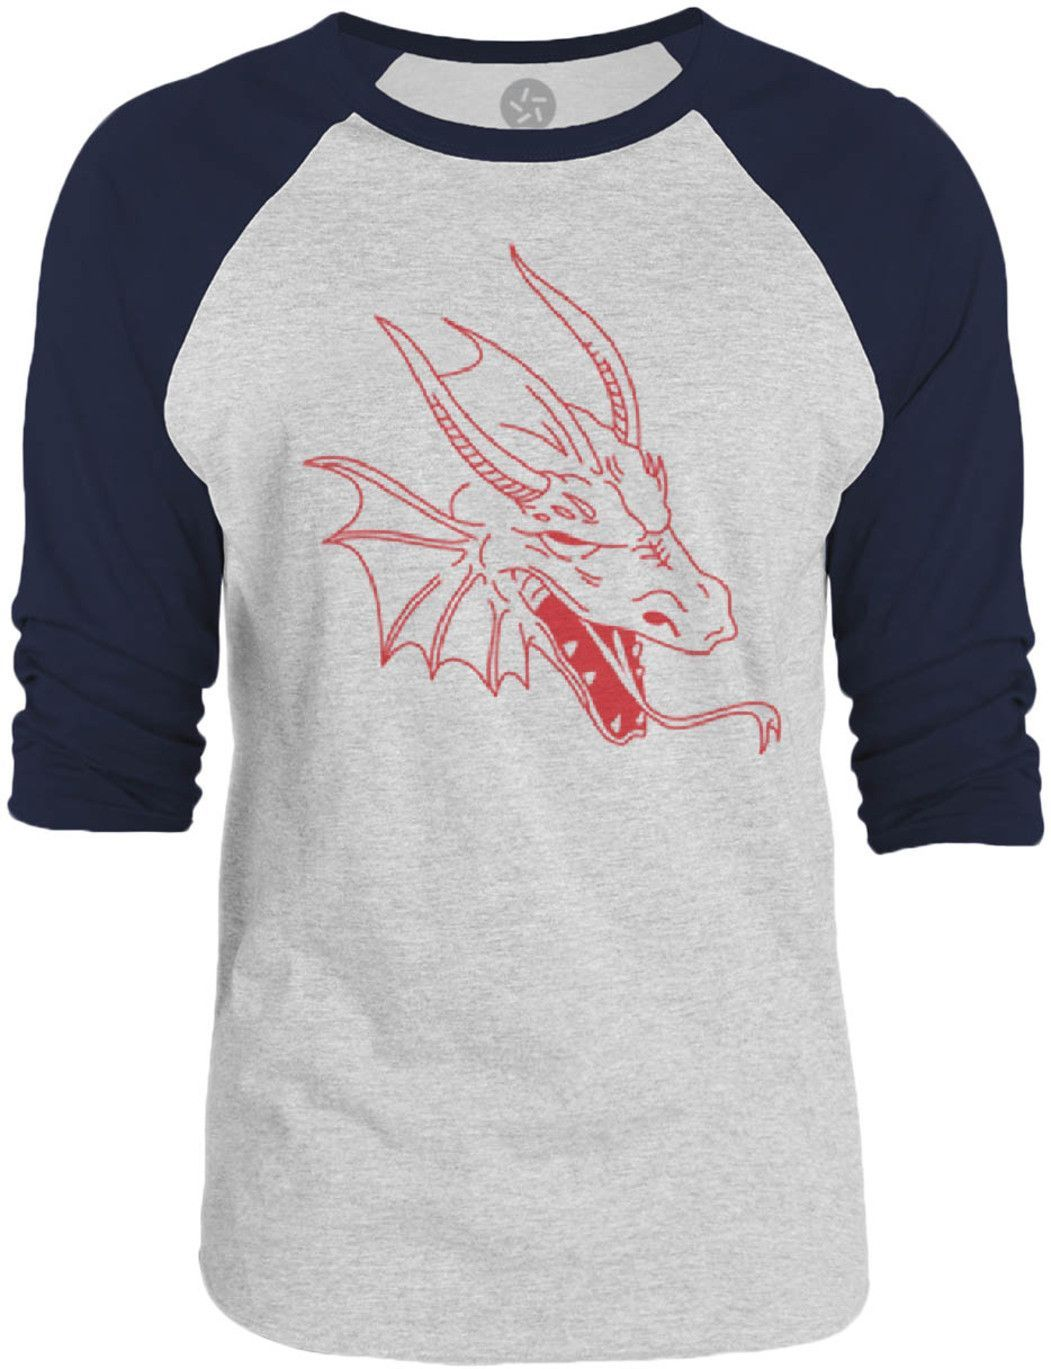 Big Texas Dragon Head (Red) 3/4-Sleeve Raglan Baseball T-Shirt